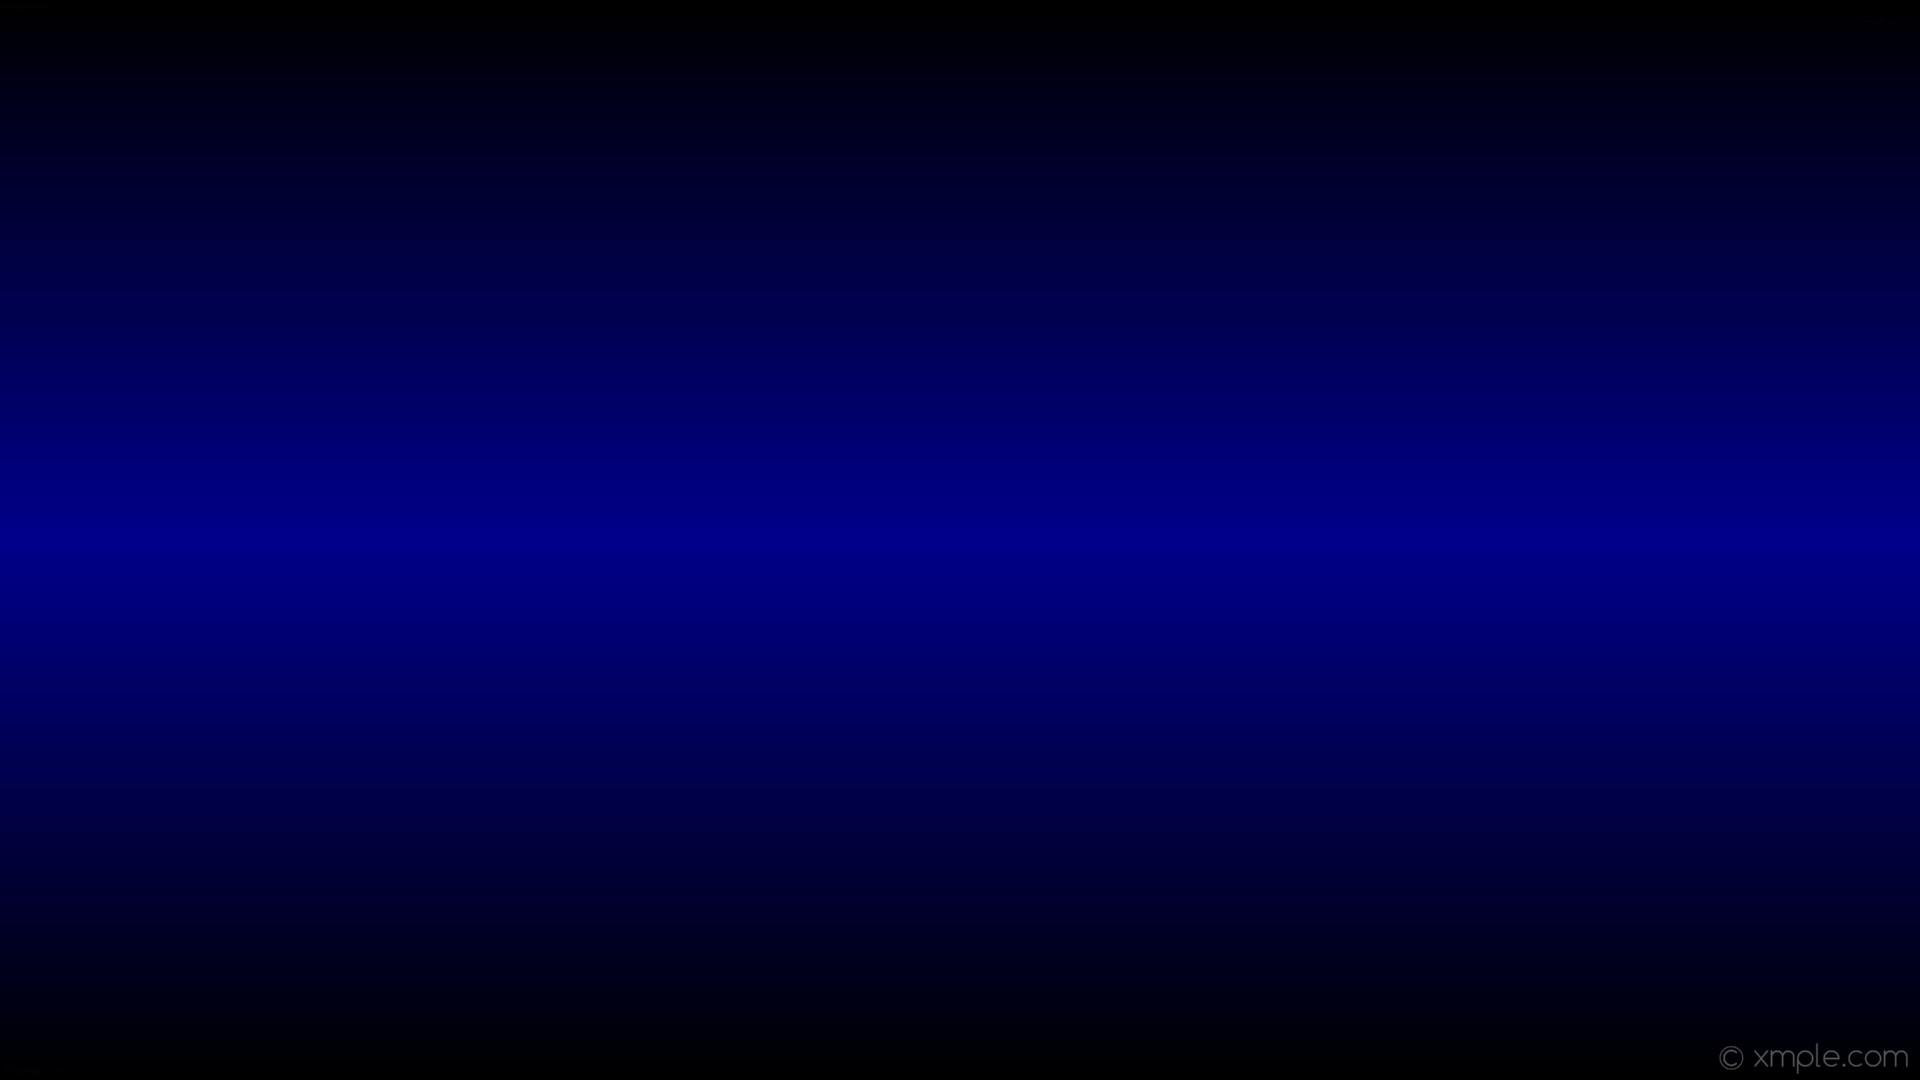 1920x1200 Plain Blue Wallpaper Group 1366A 768 37 Wallpapers